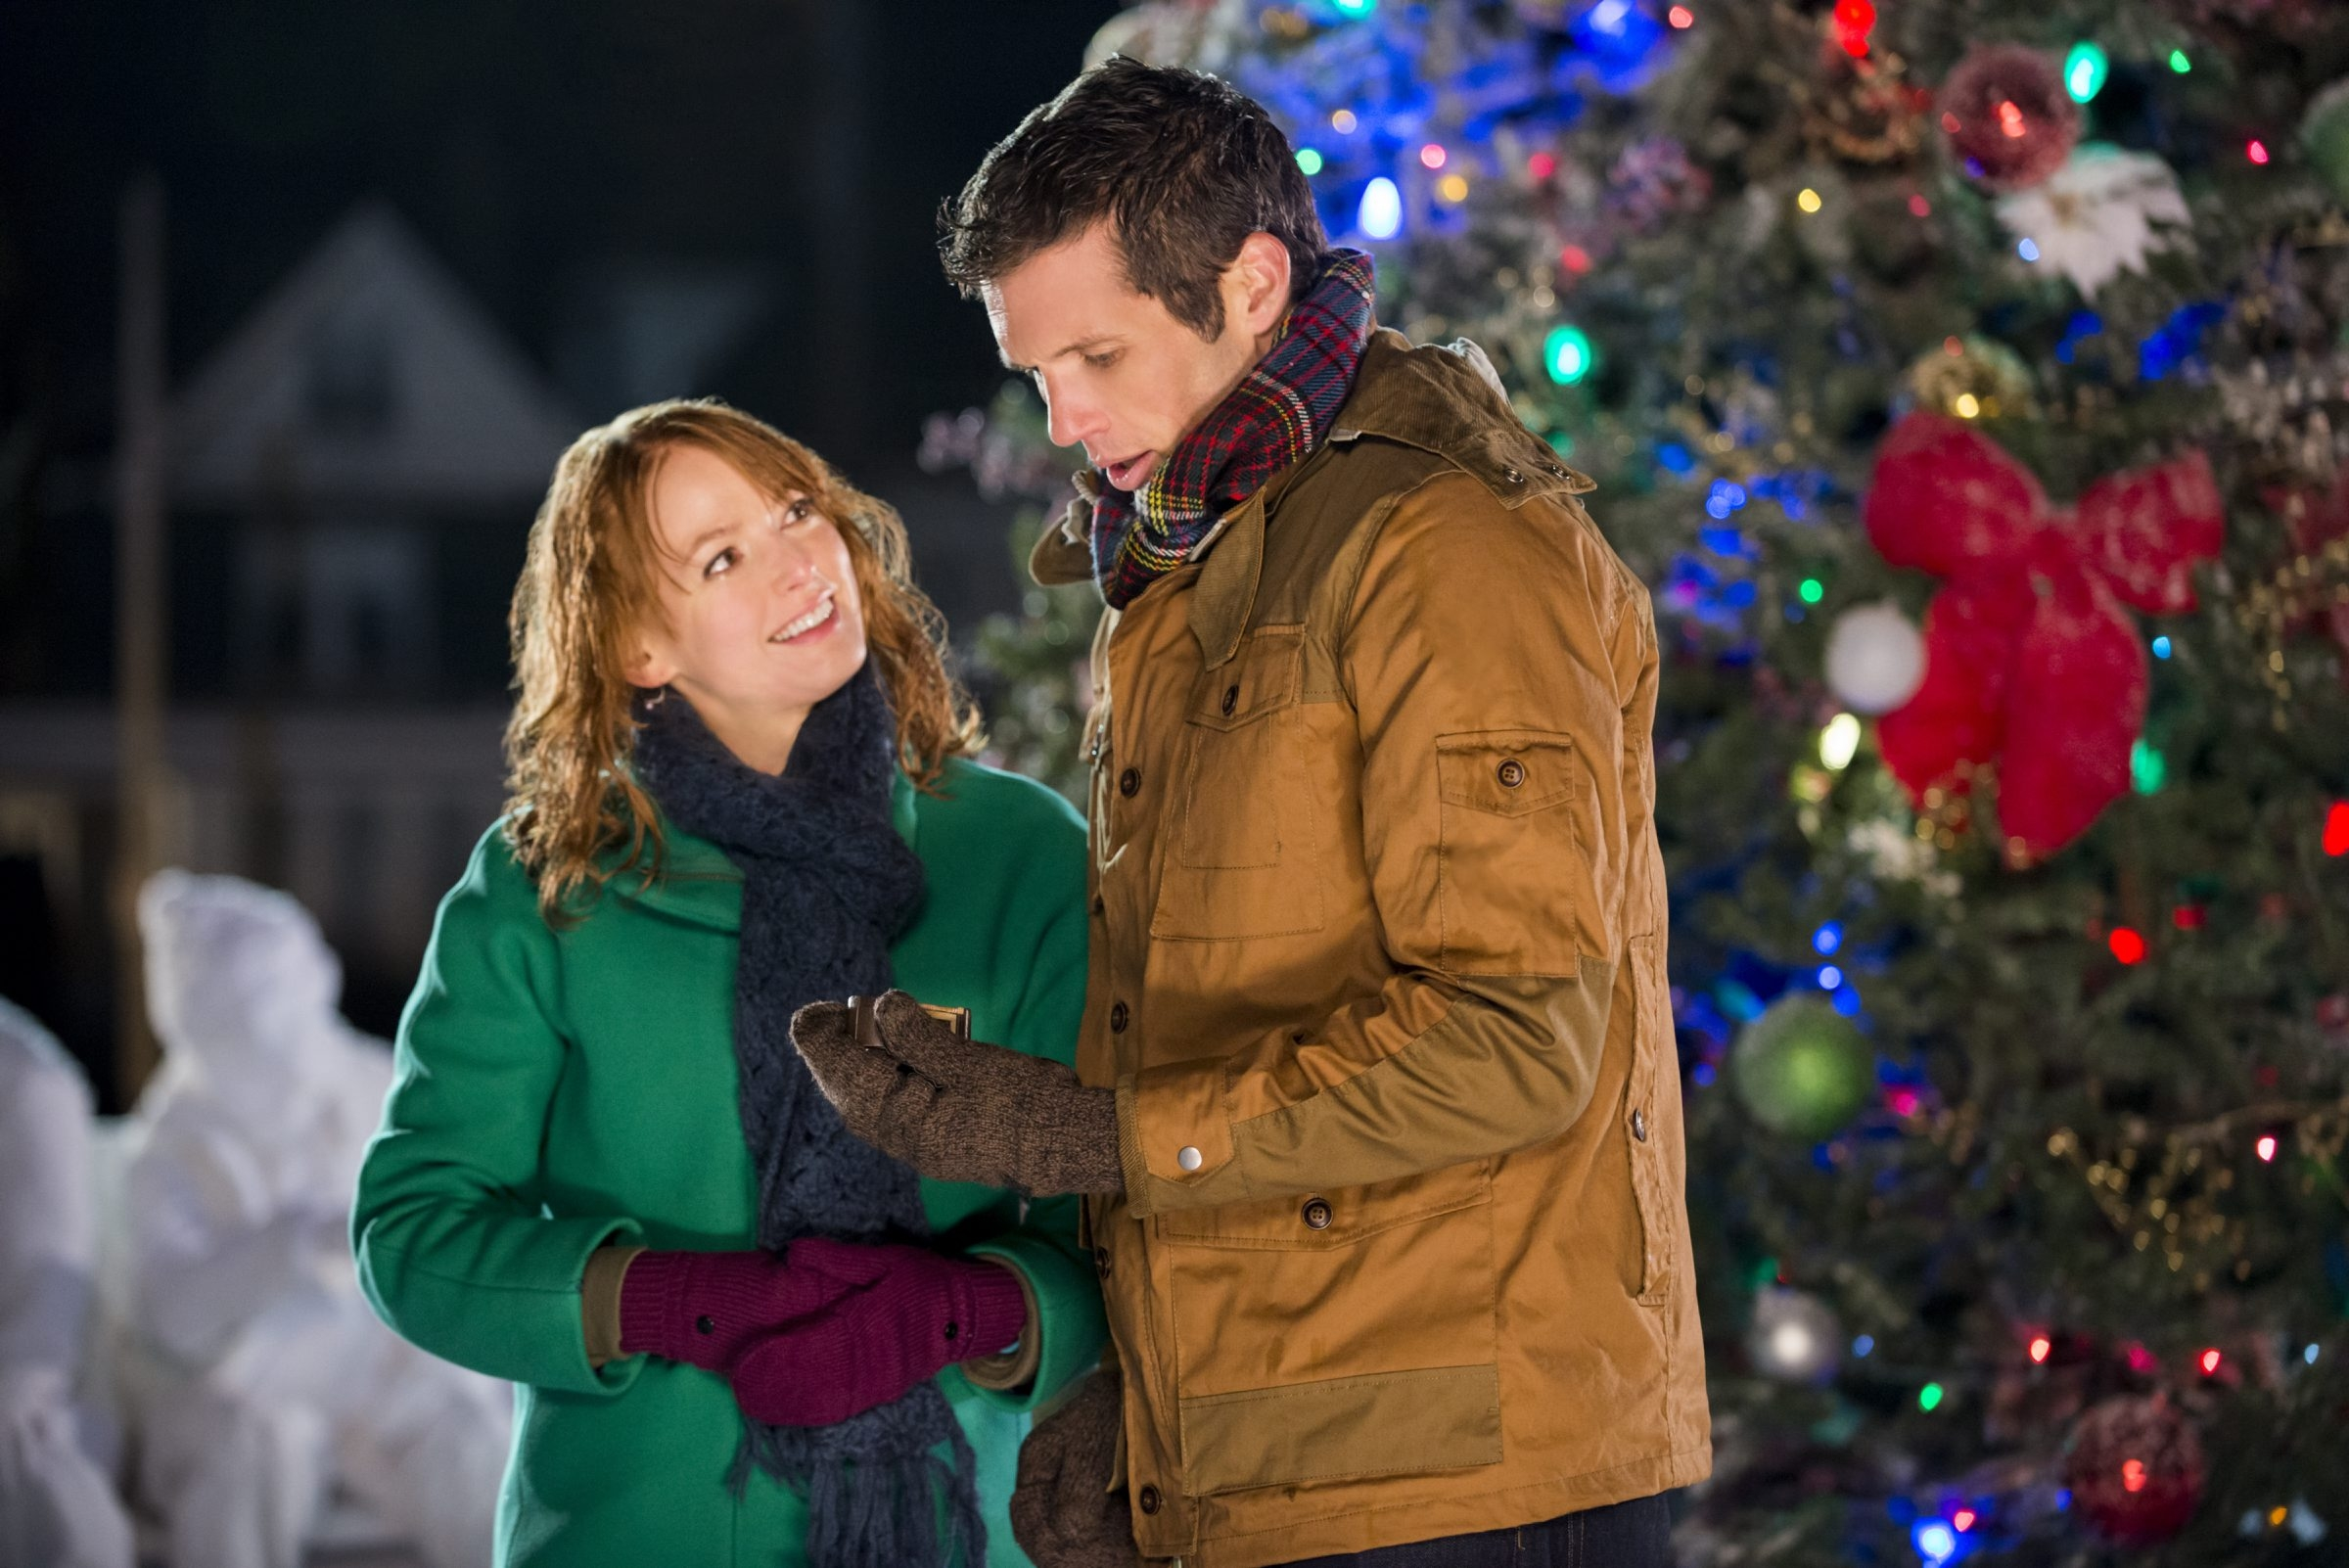 Hallmark Movies Christmas In July.Hallmark Presents Christmas Movies In July The Buffalo News